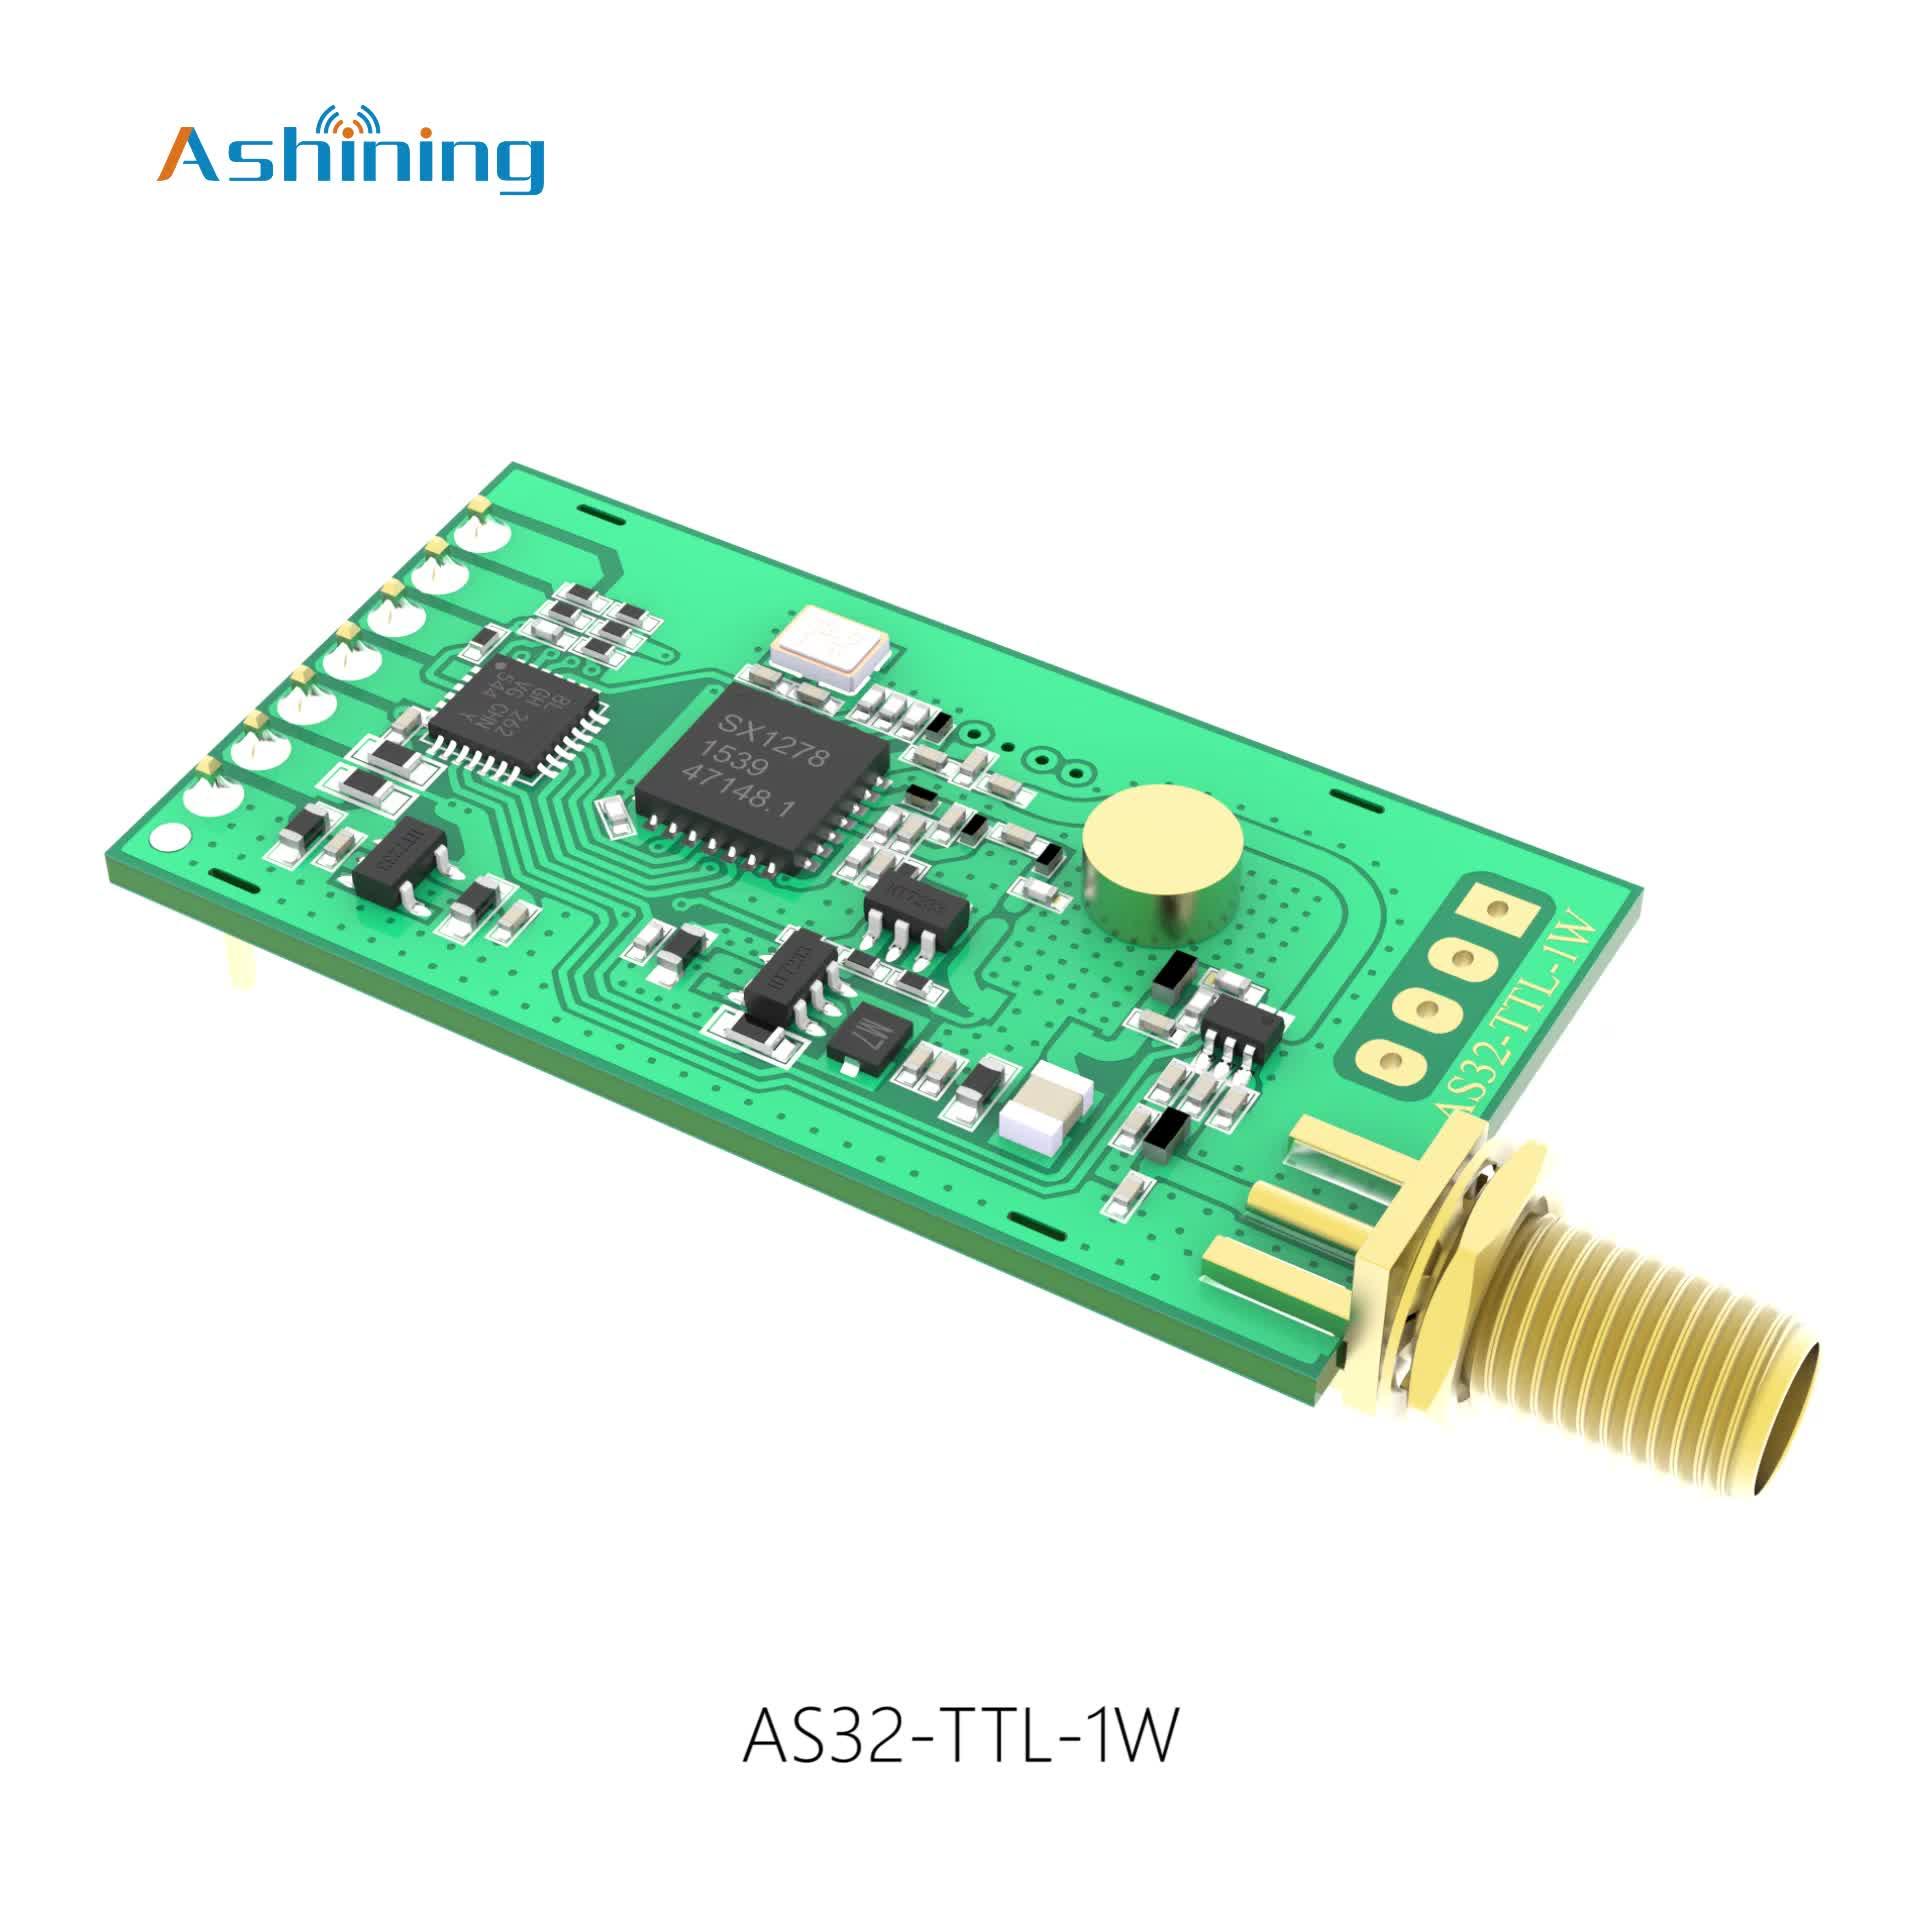 High Quality Sx1276/sx1278 Wireless 433mhz Data Transceiver Lora Evaluation Board Sx1276 Module Sx1278/sx1276